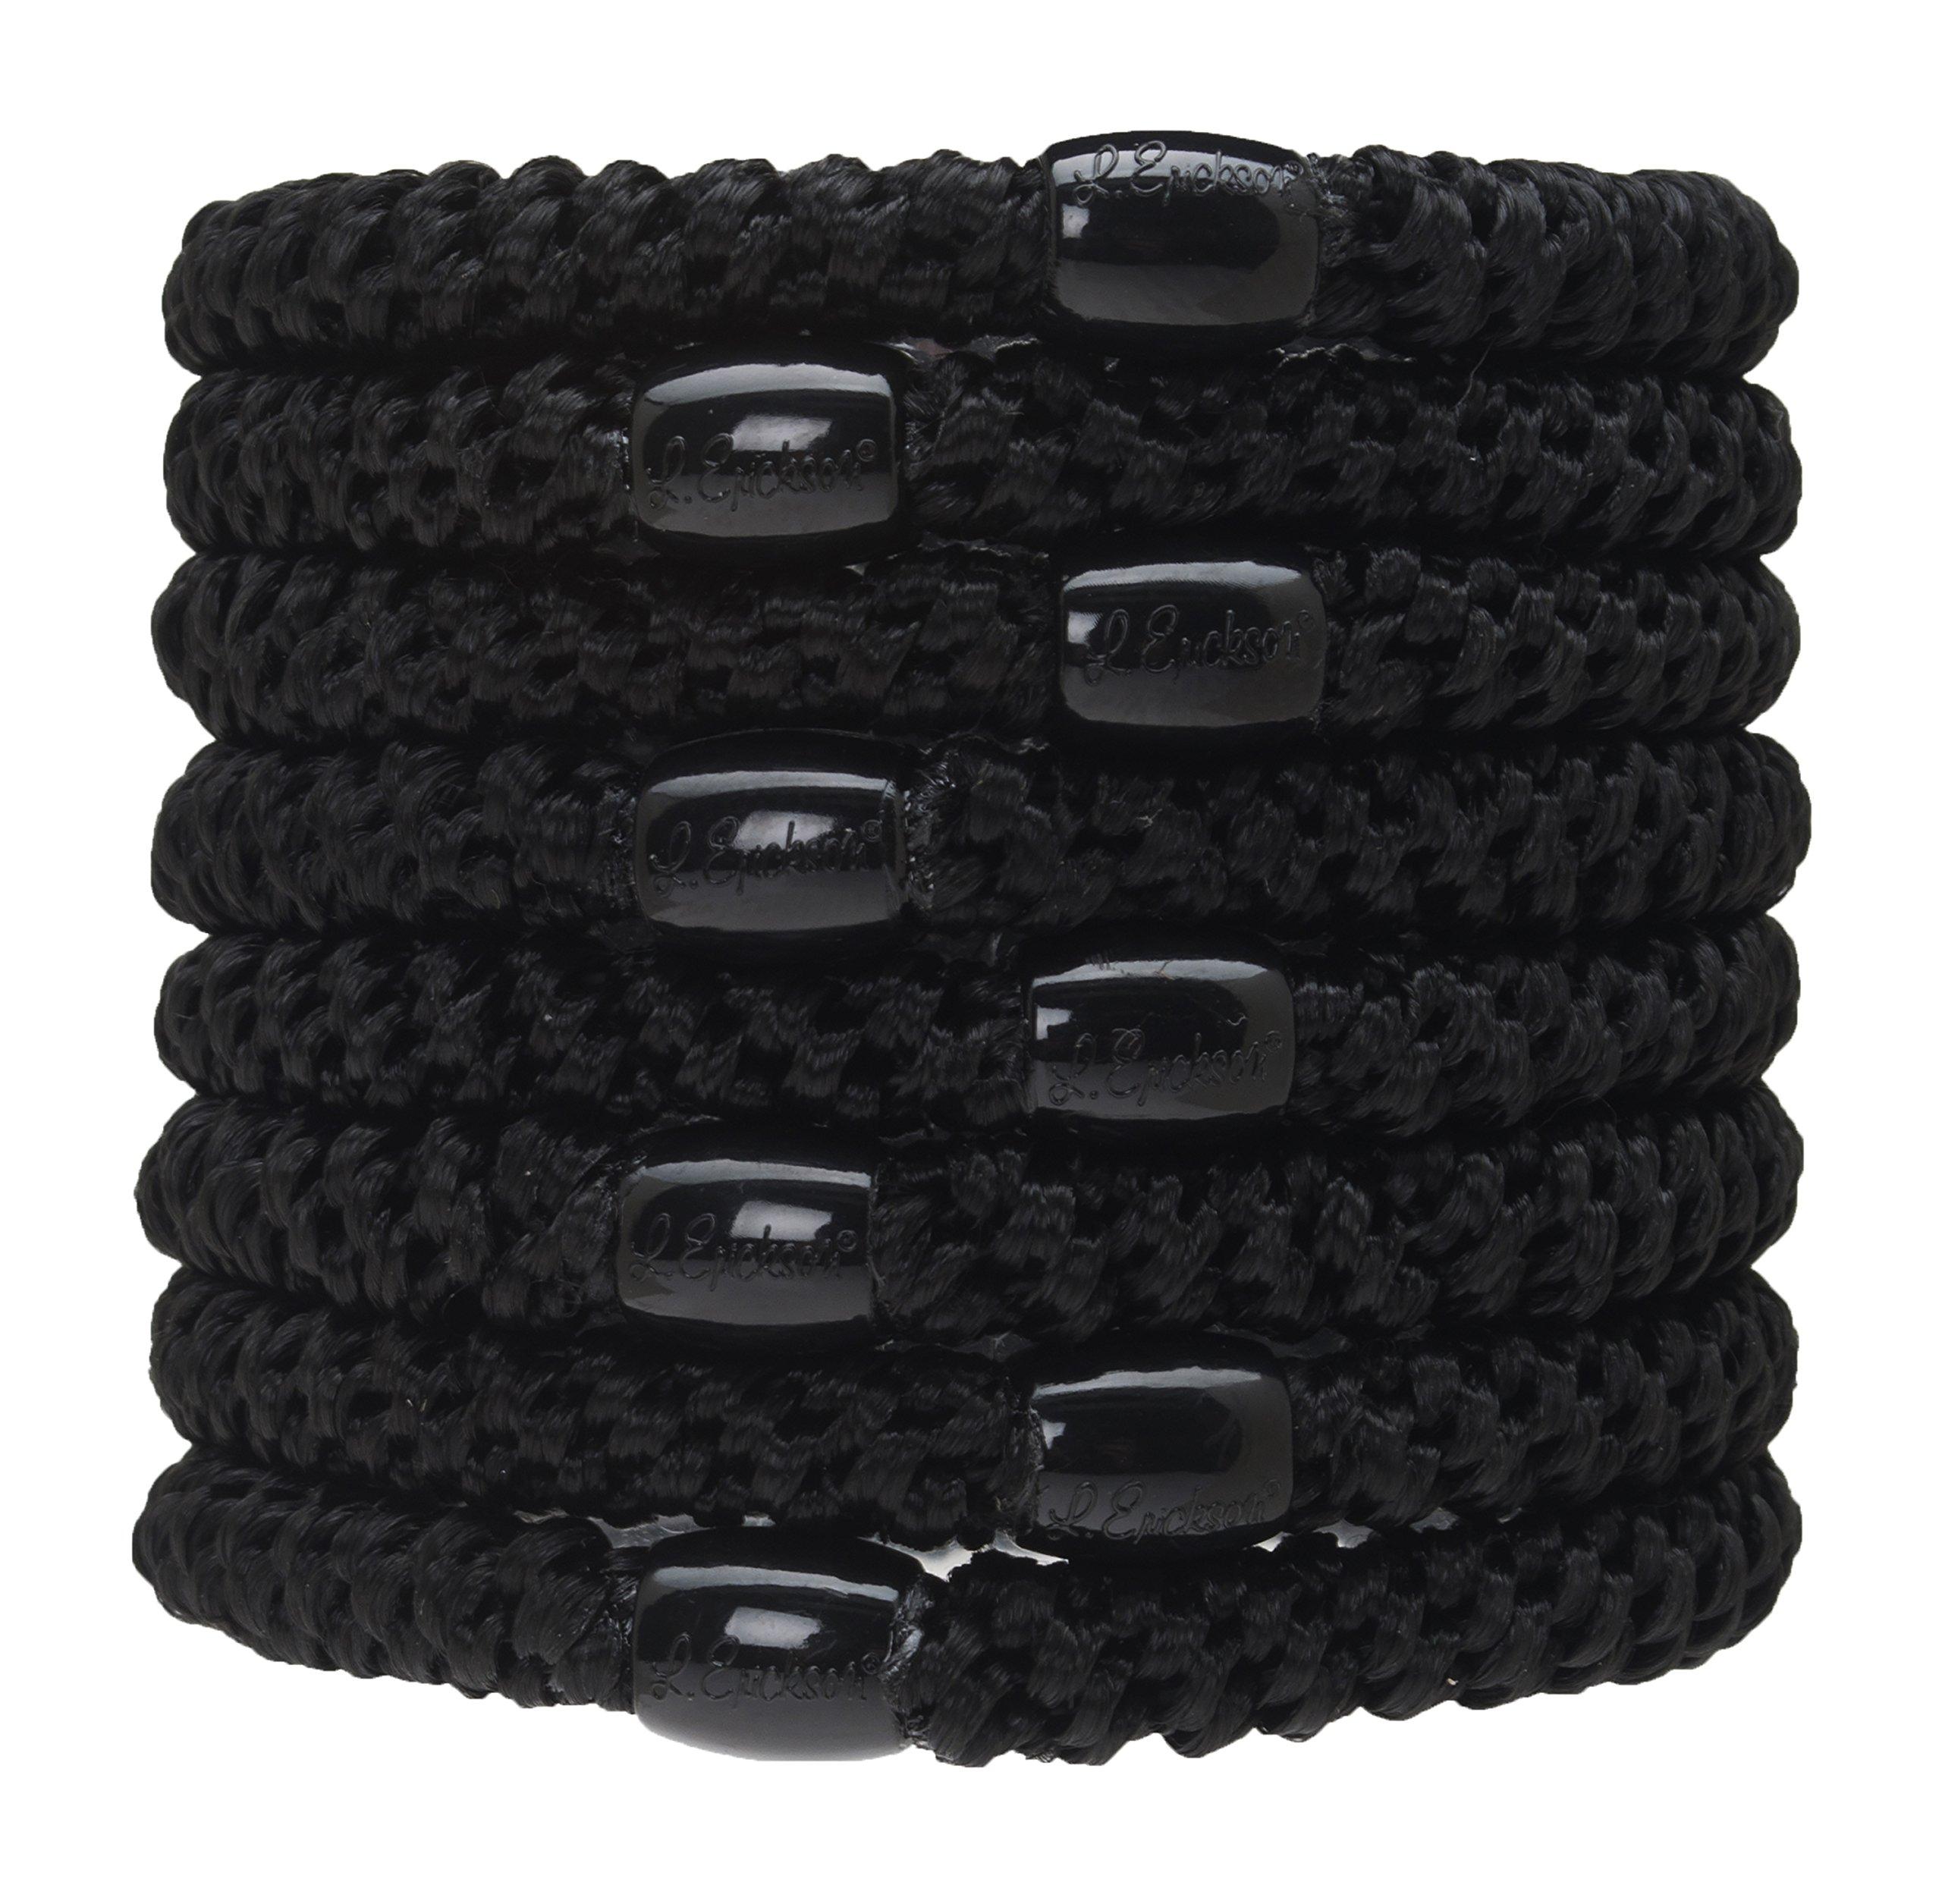 L. Erickson Grab & Go Ponytail Holders - Set of Eight - Black